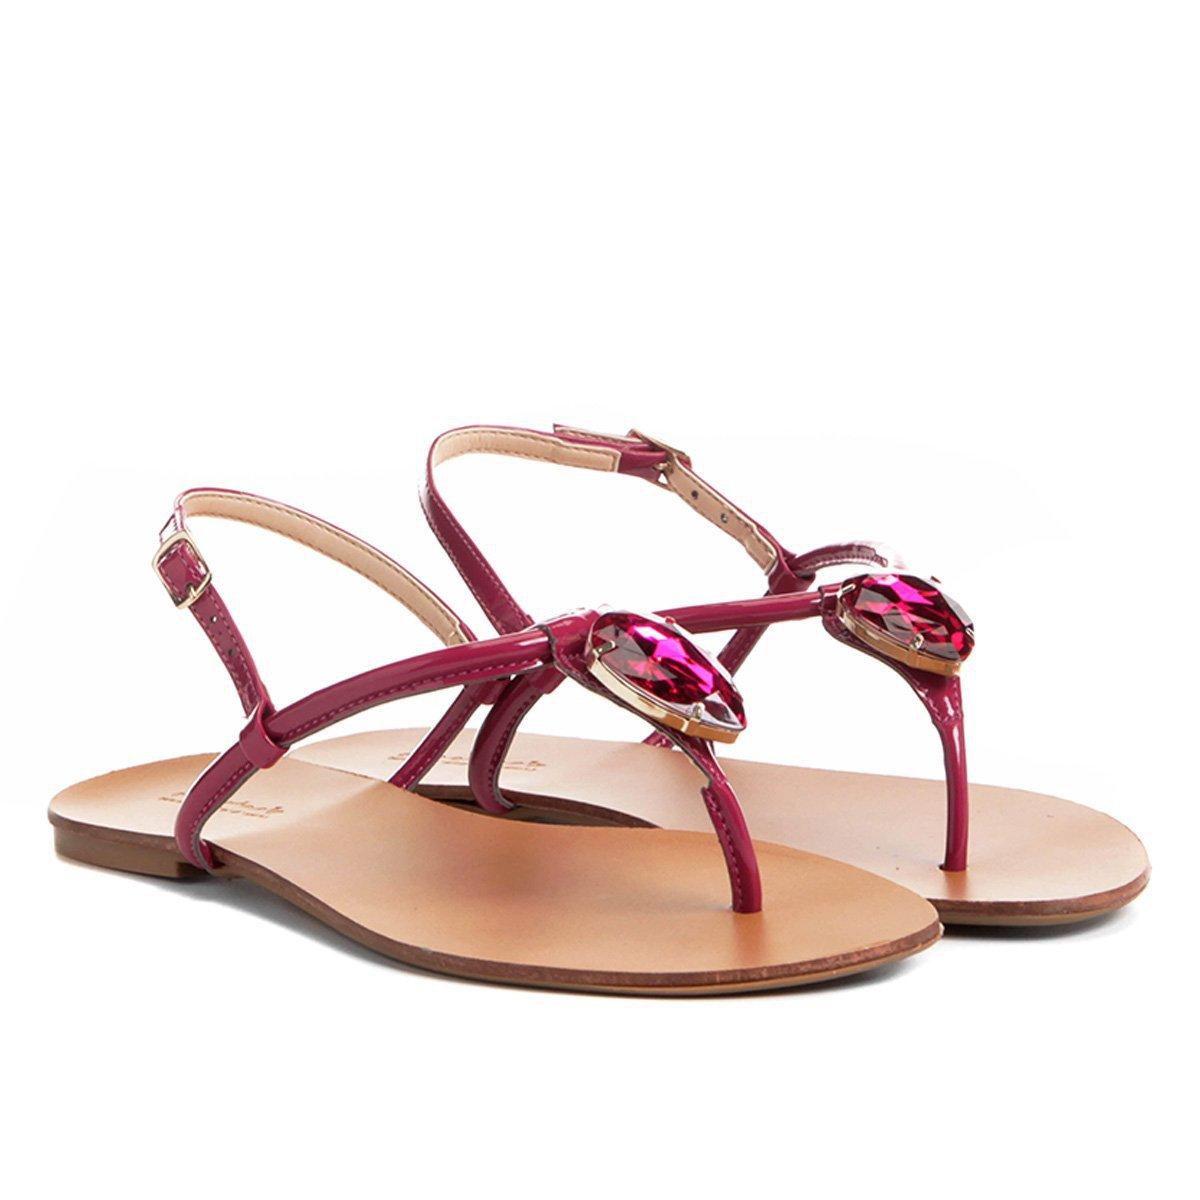 Shoestock Rasteira Pedra Shoestock Pink Rasteira Cristal Pink Cristal Shoestock Pedra Rasteira Pedra OSAqO1Y